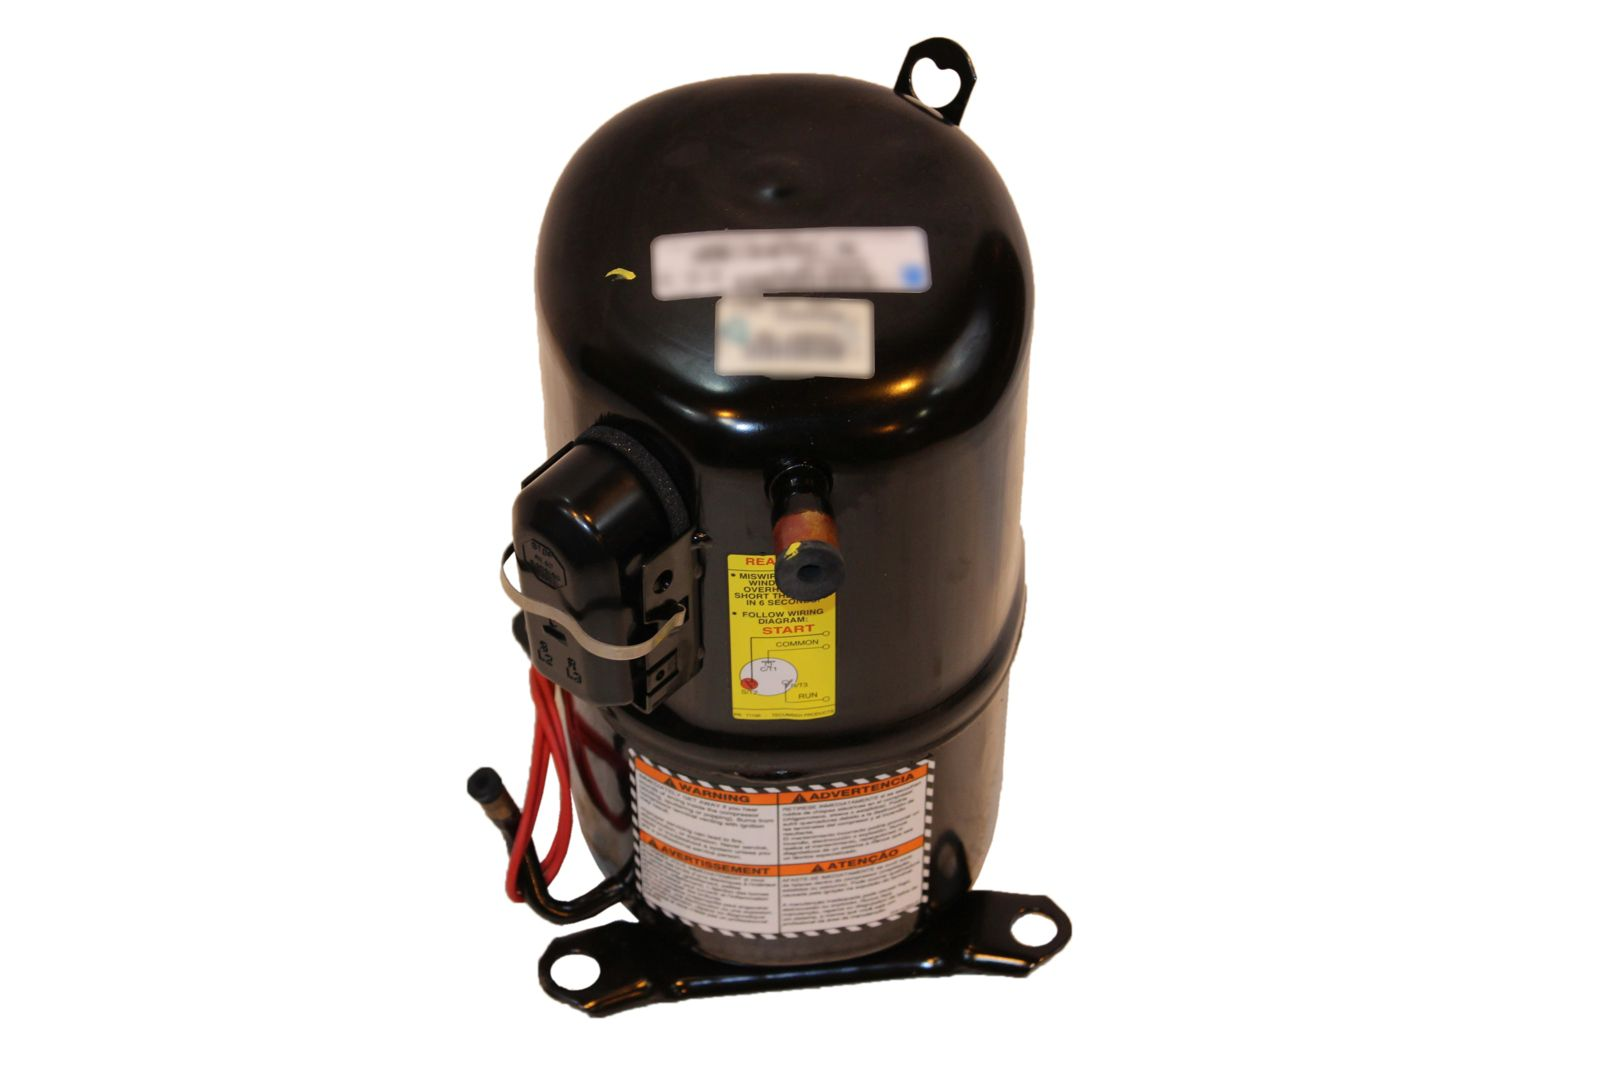 factory authorized parts™ - p031-2429 tecumseh 24,400 btuh compressor